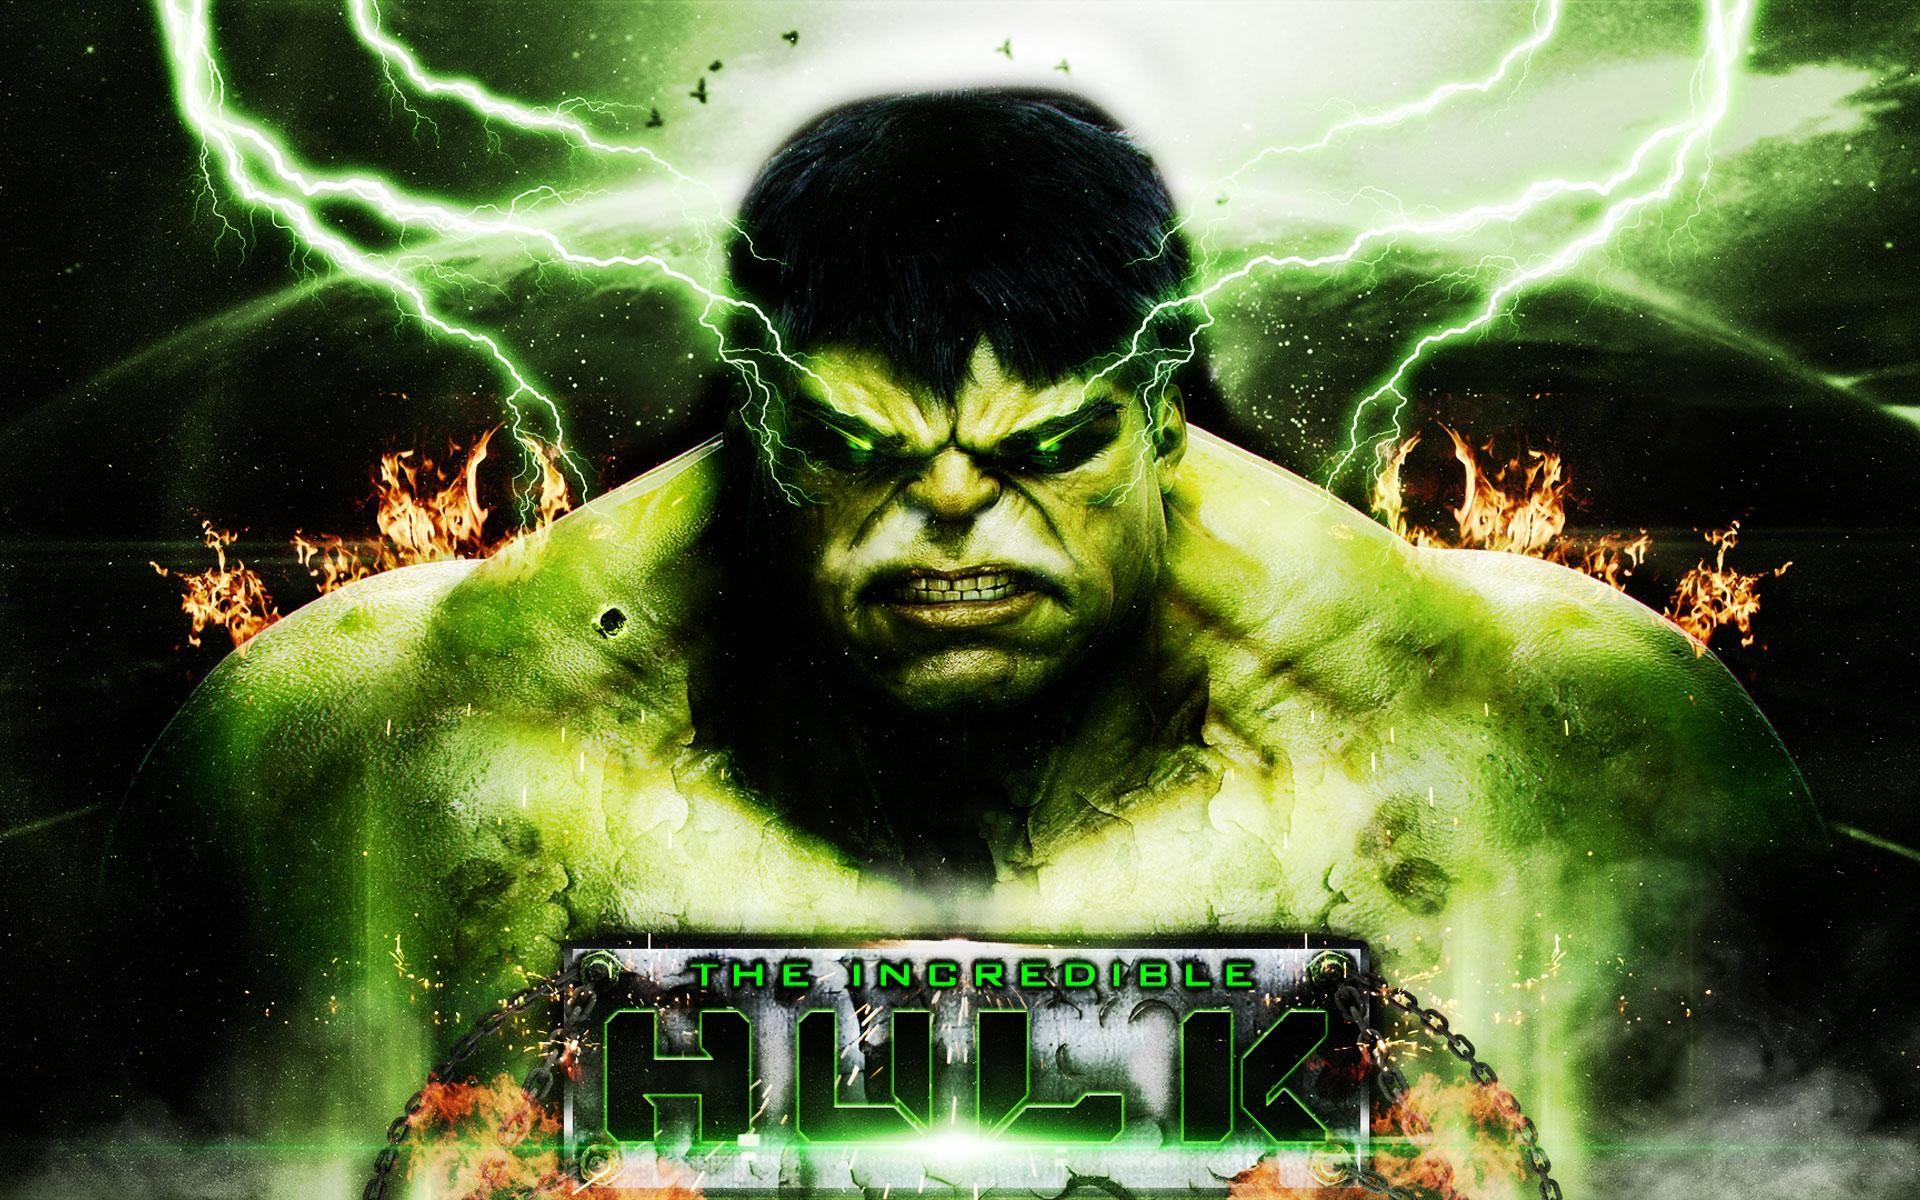 66 Hulk Live Wallpapers On Wallpaperplay Hulk Image Free